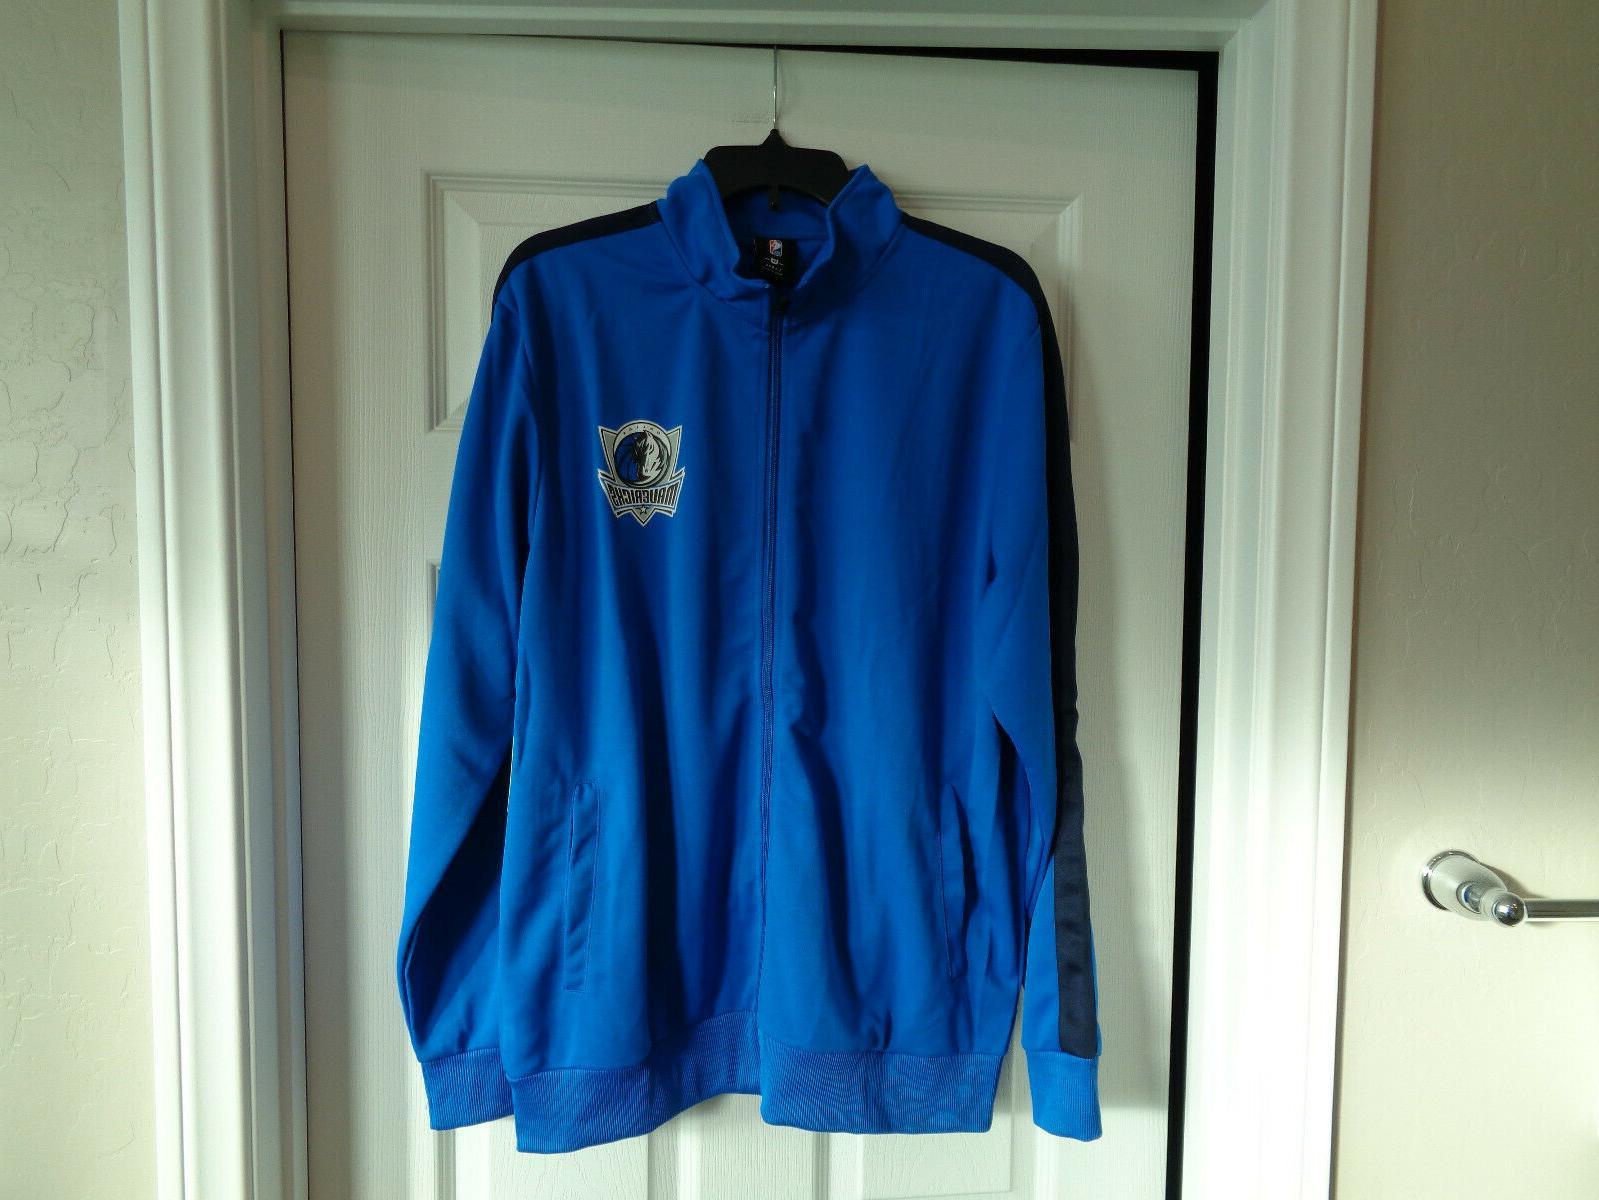 new nba authentic dallas mavericks zipper jacket